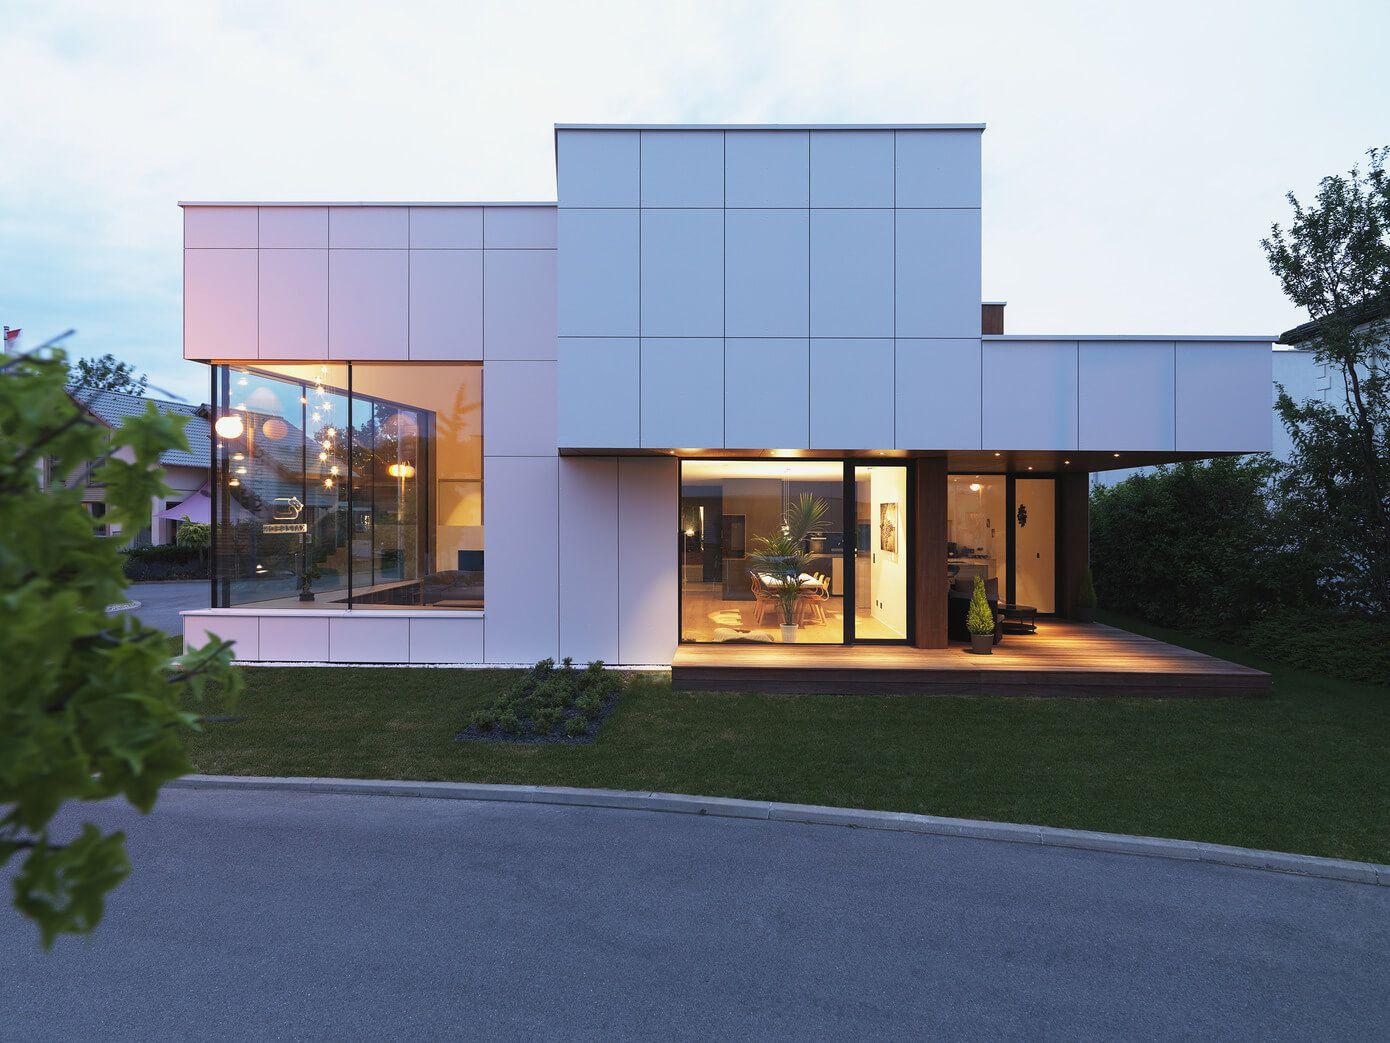 Planos de casa de dos plantas moderna for Fachadas modernas para casas pequenas de una planta